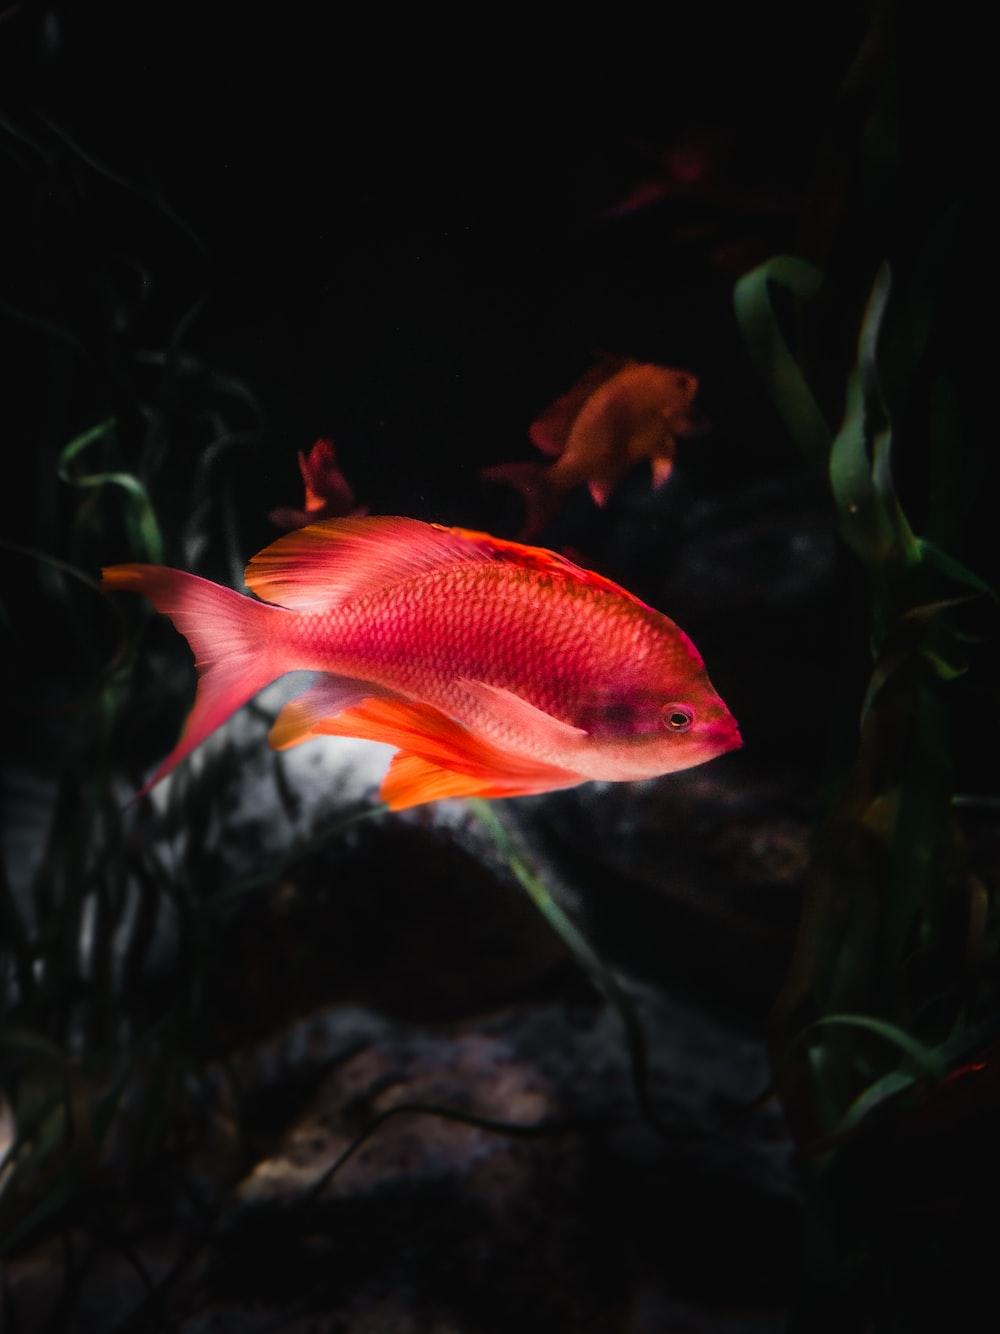 orange and white fish in fish tank